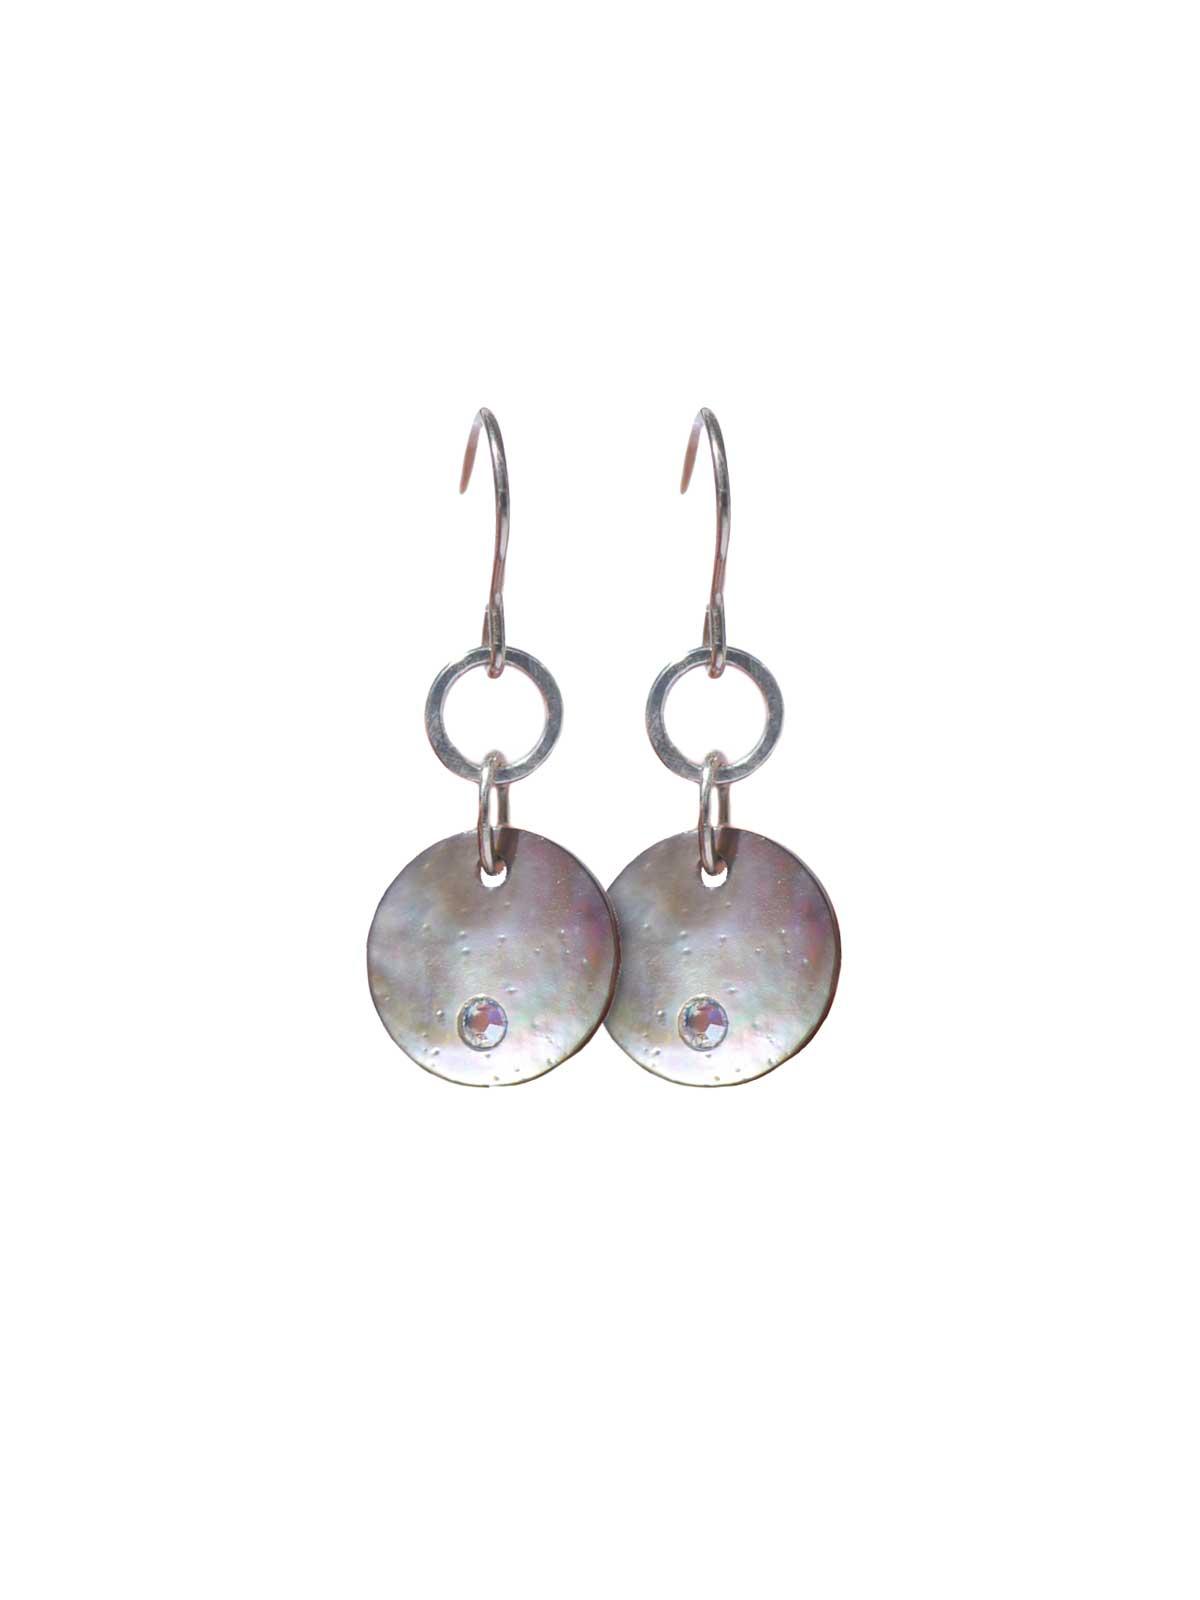 Earrings Sterling Silver Mother-of-pearl Swarovski crystal